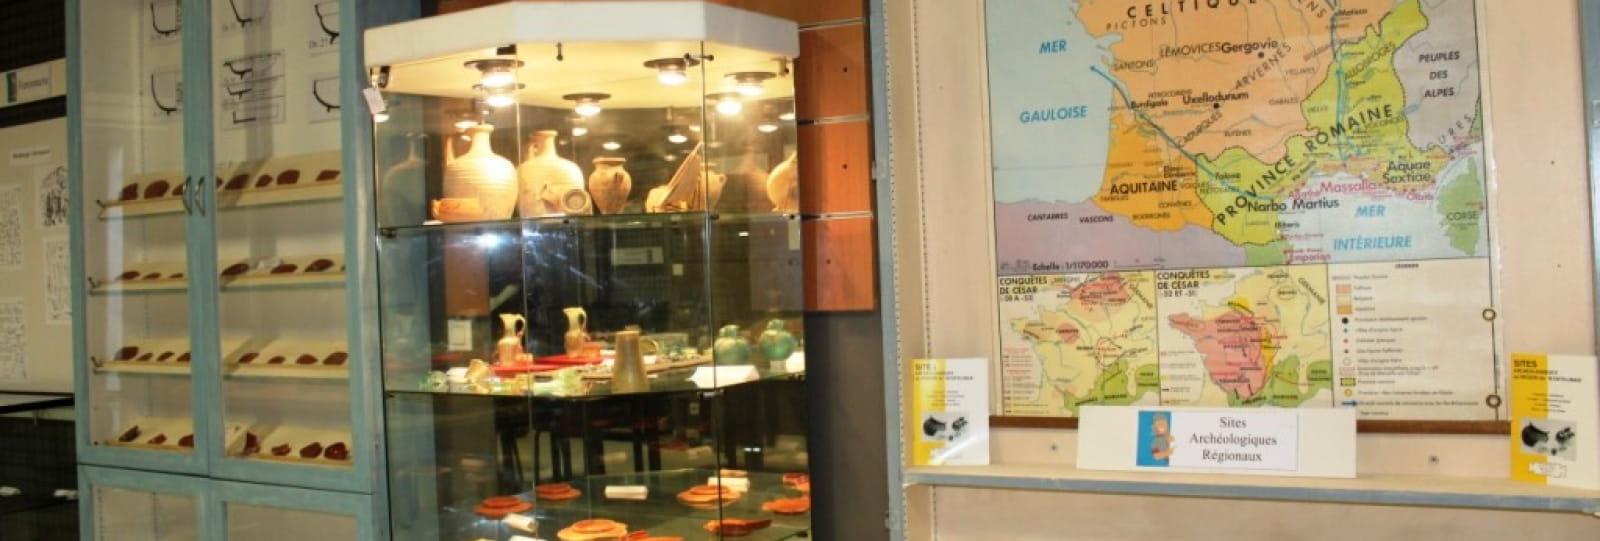 Associative museum (archaeology, geology, history)